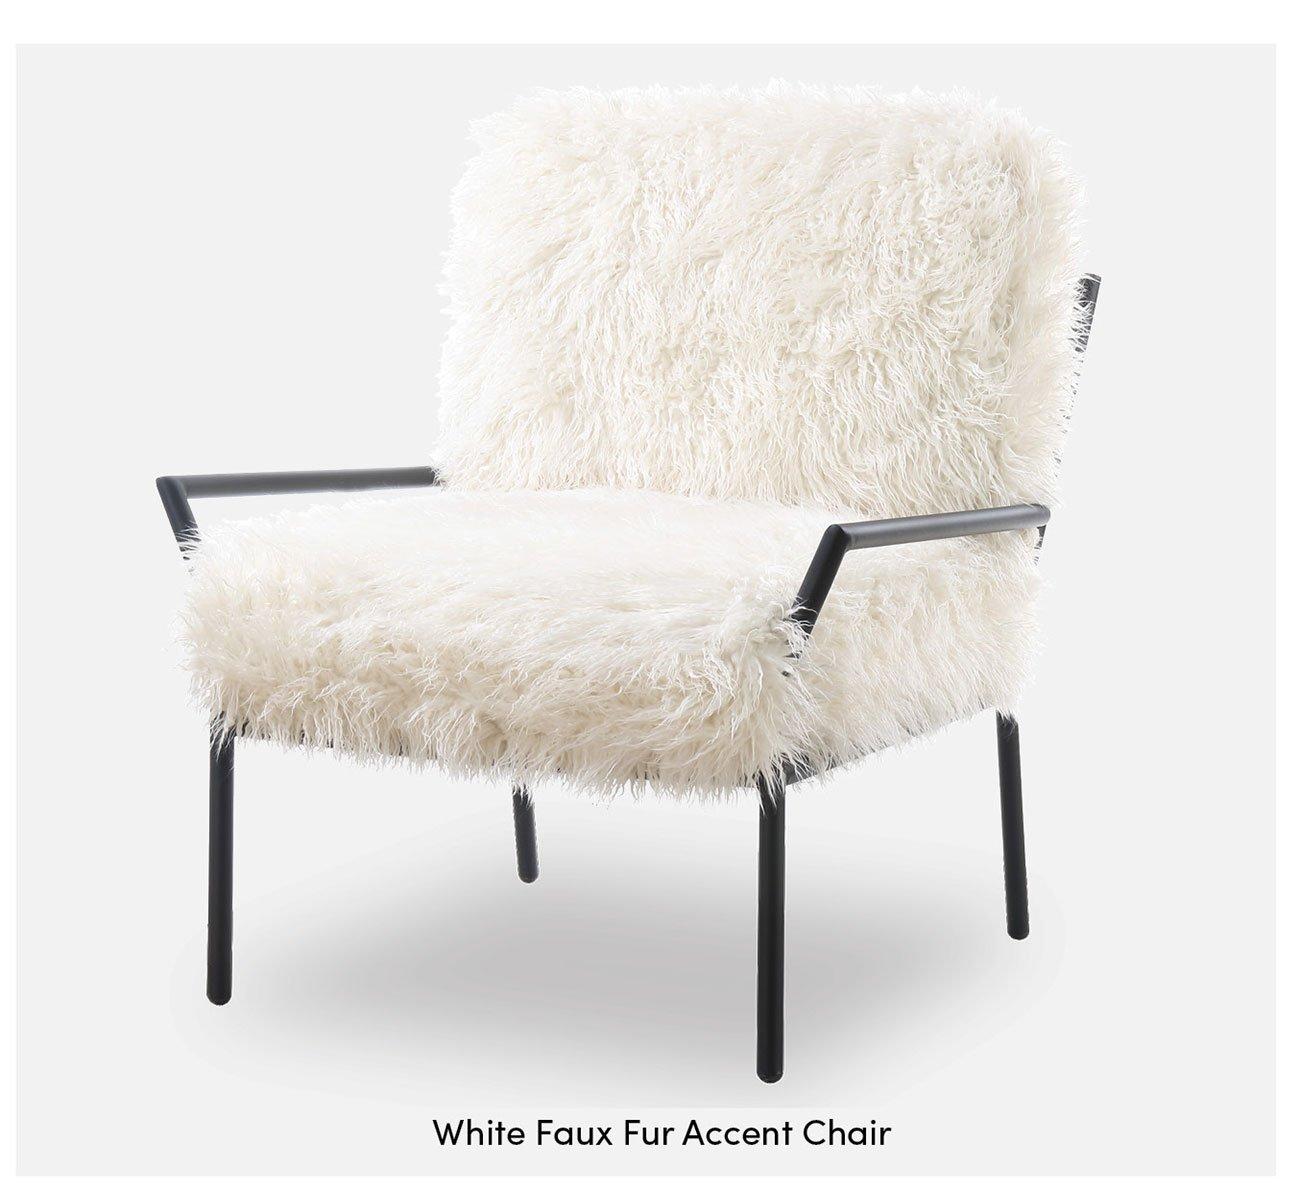 White-faux-fur-accent-chair